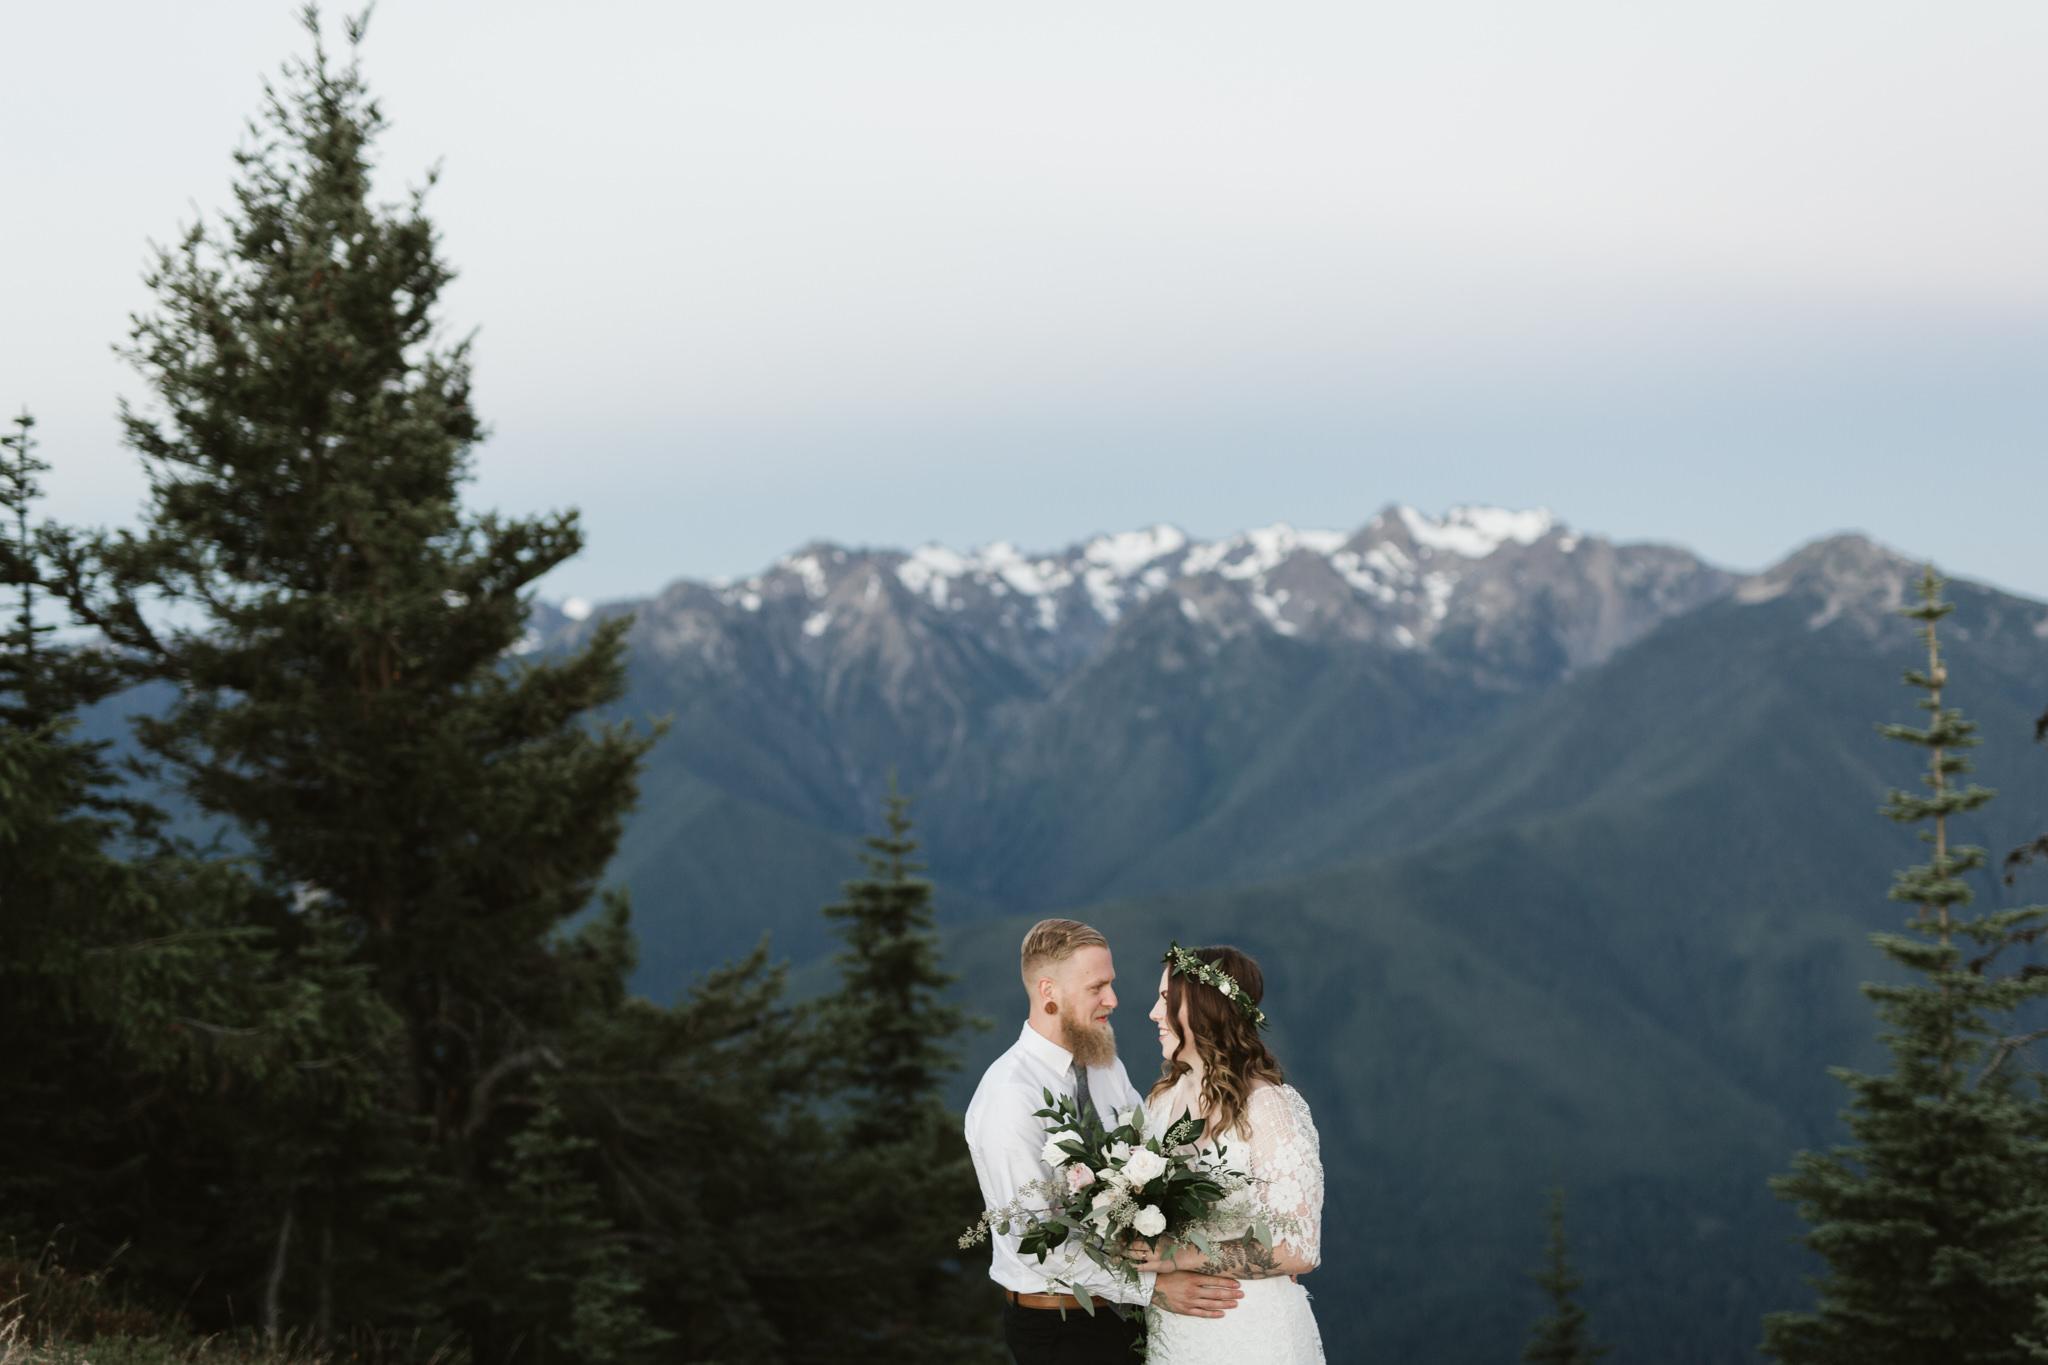 Jesse-Kasie-Hurricane-Ridge-Wedding-20.jpg